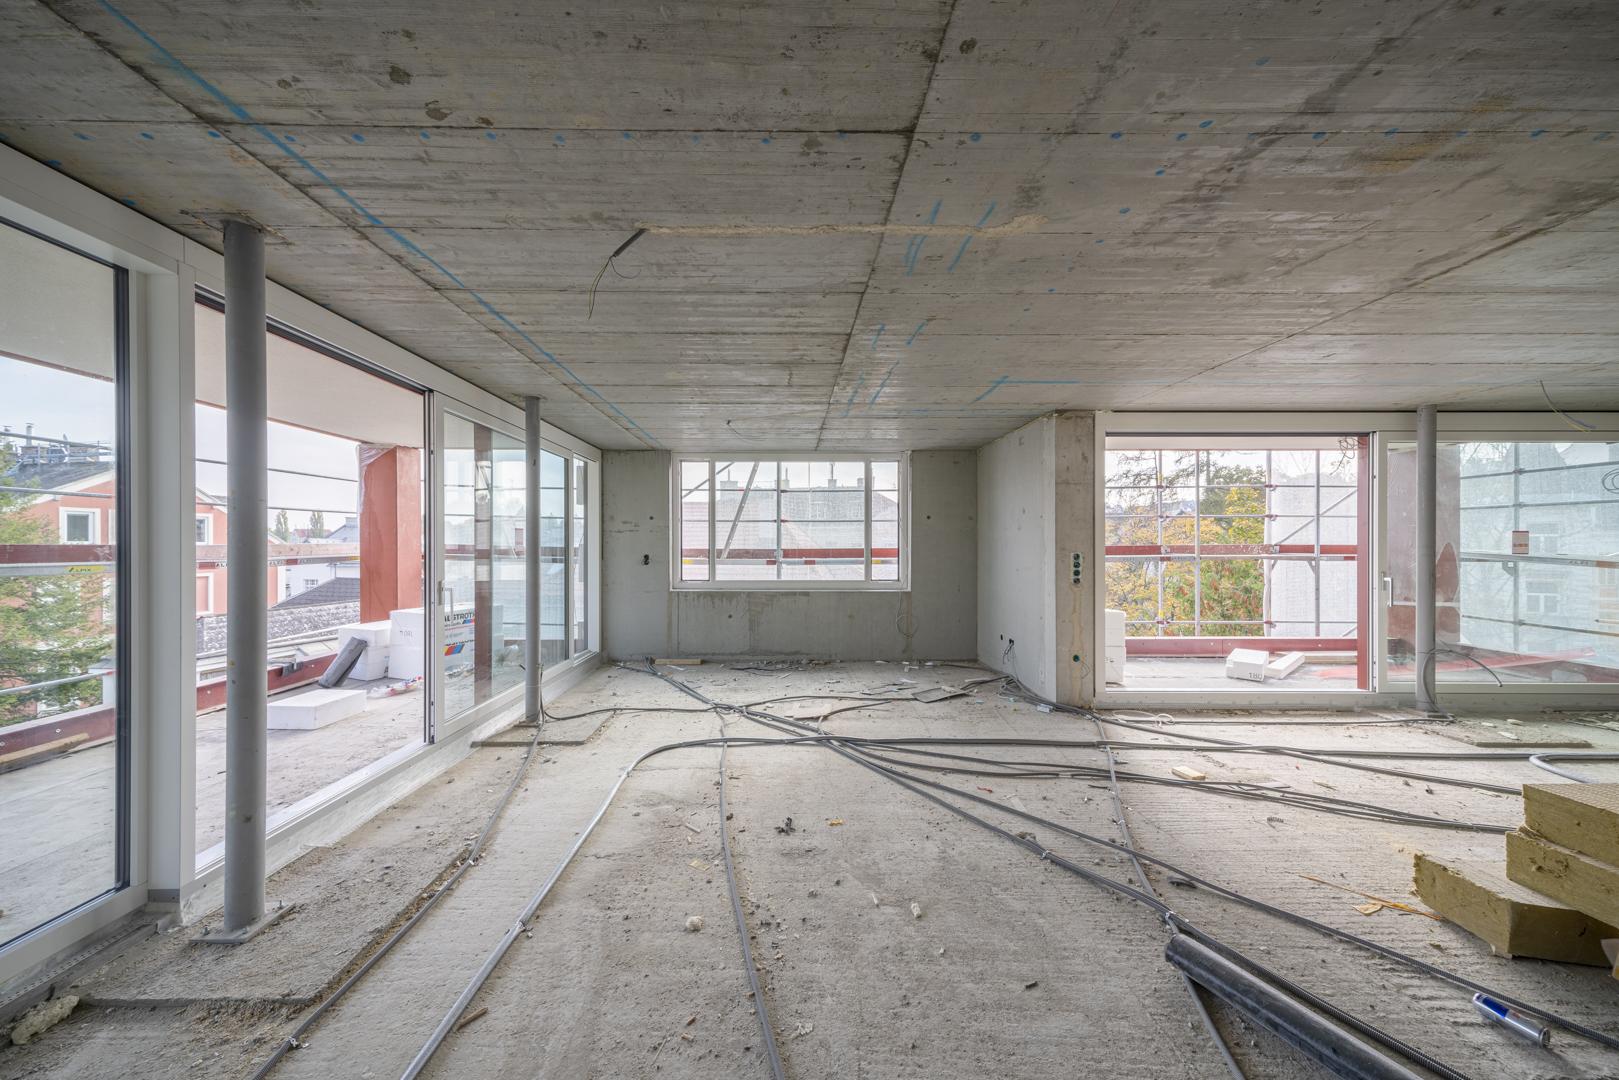 Baustellendokumentation Neubau Wien von Fotograf Michael Pinzolits